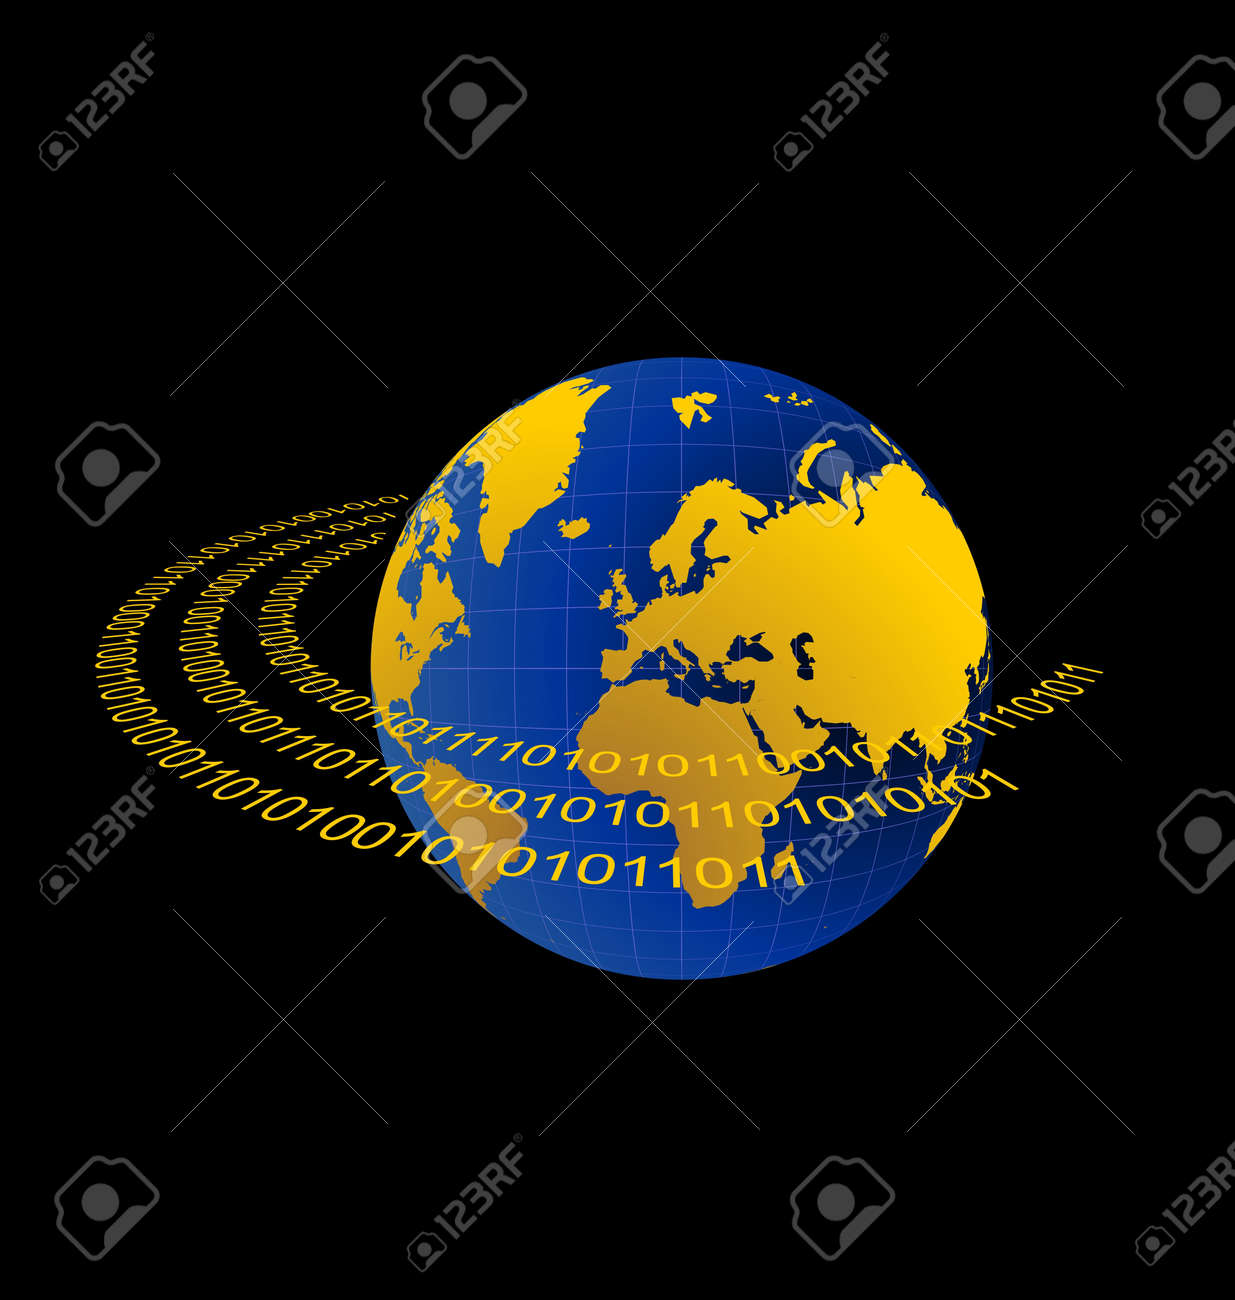 Illustration of data stream around terra planet on black background Stock Vector - 7852087